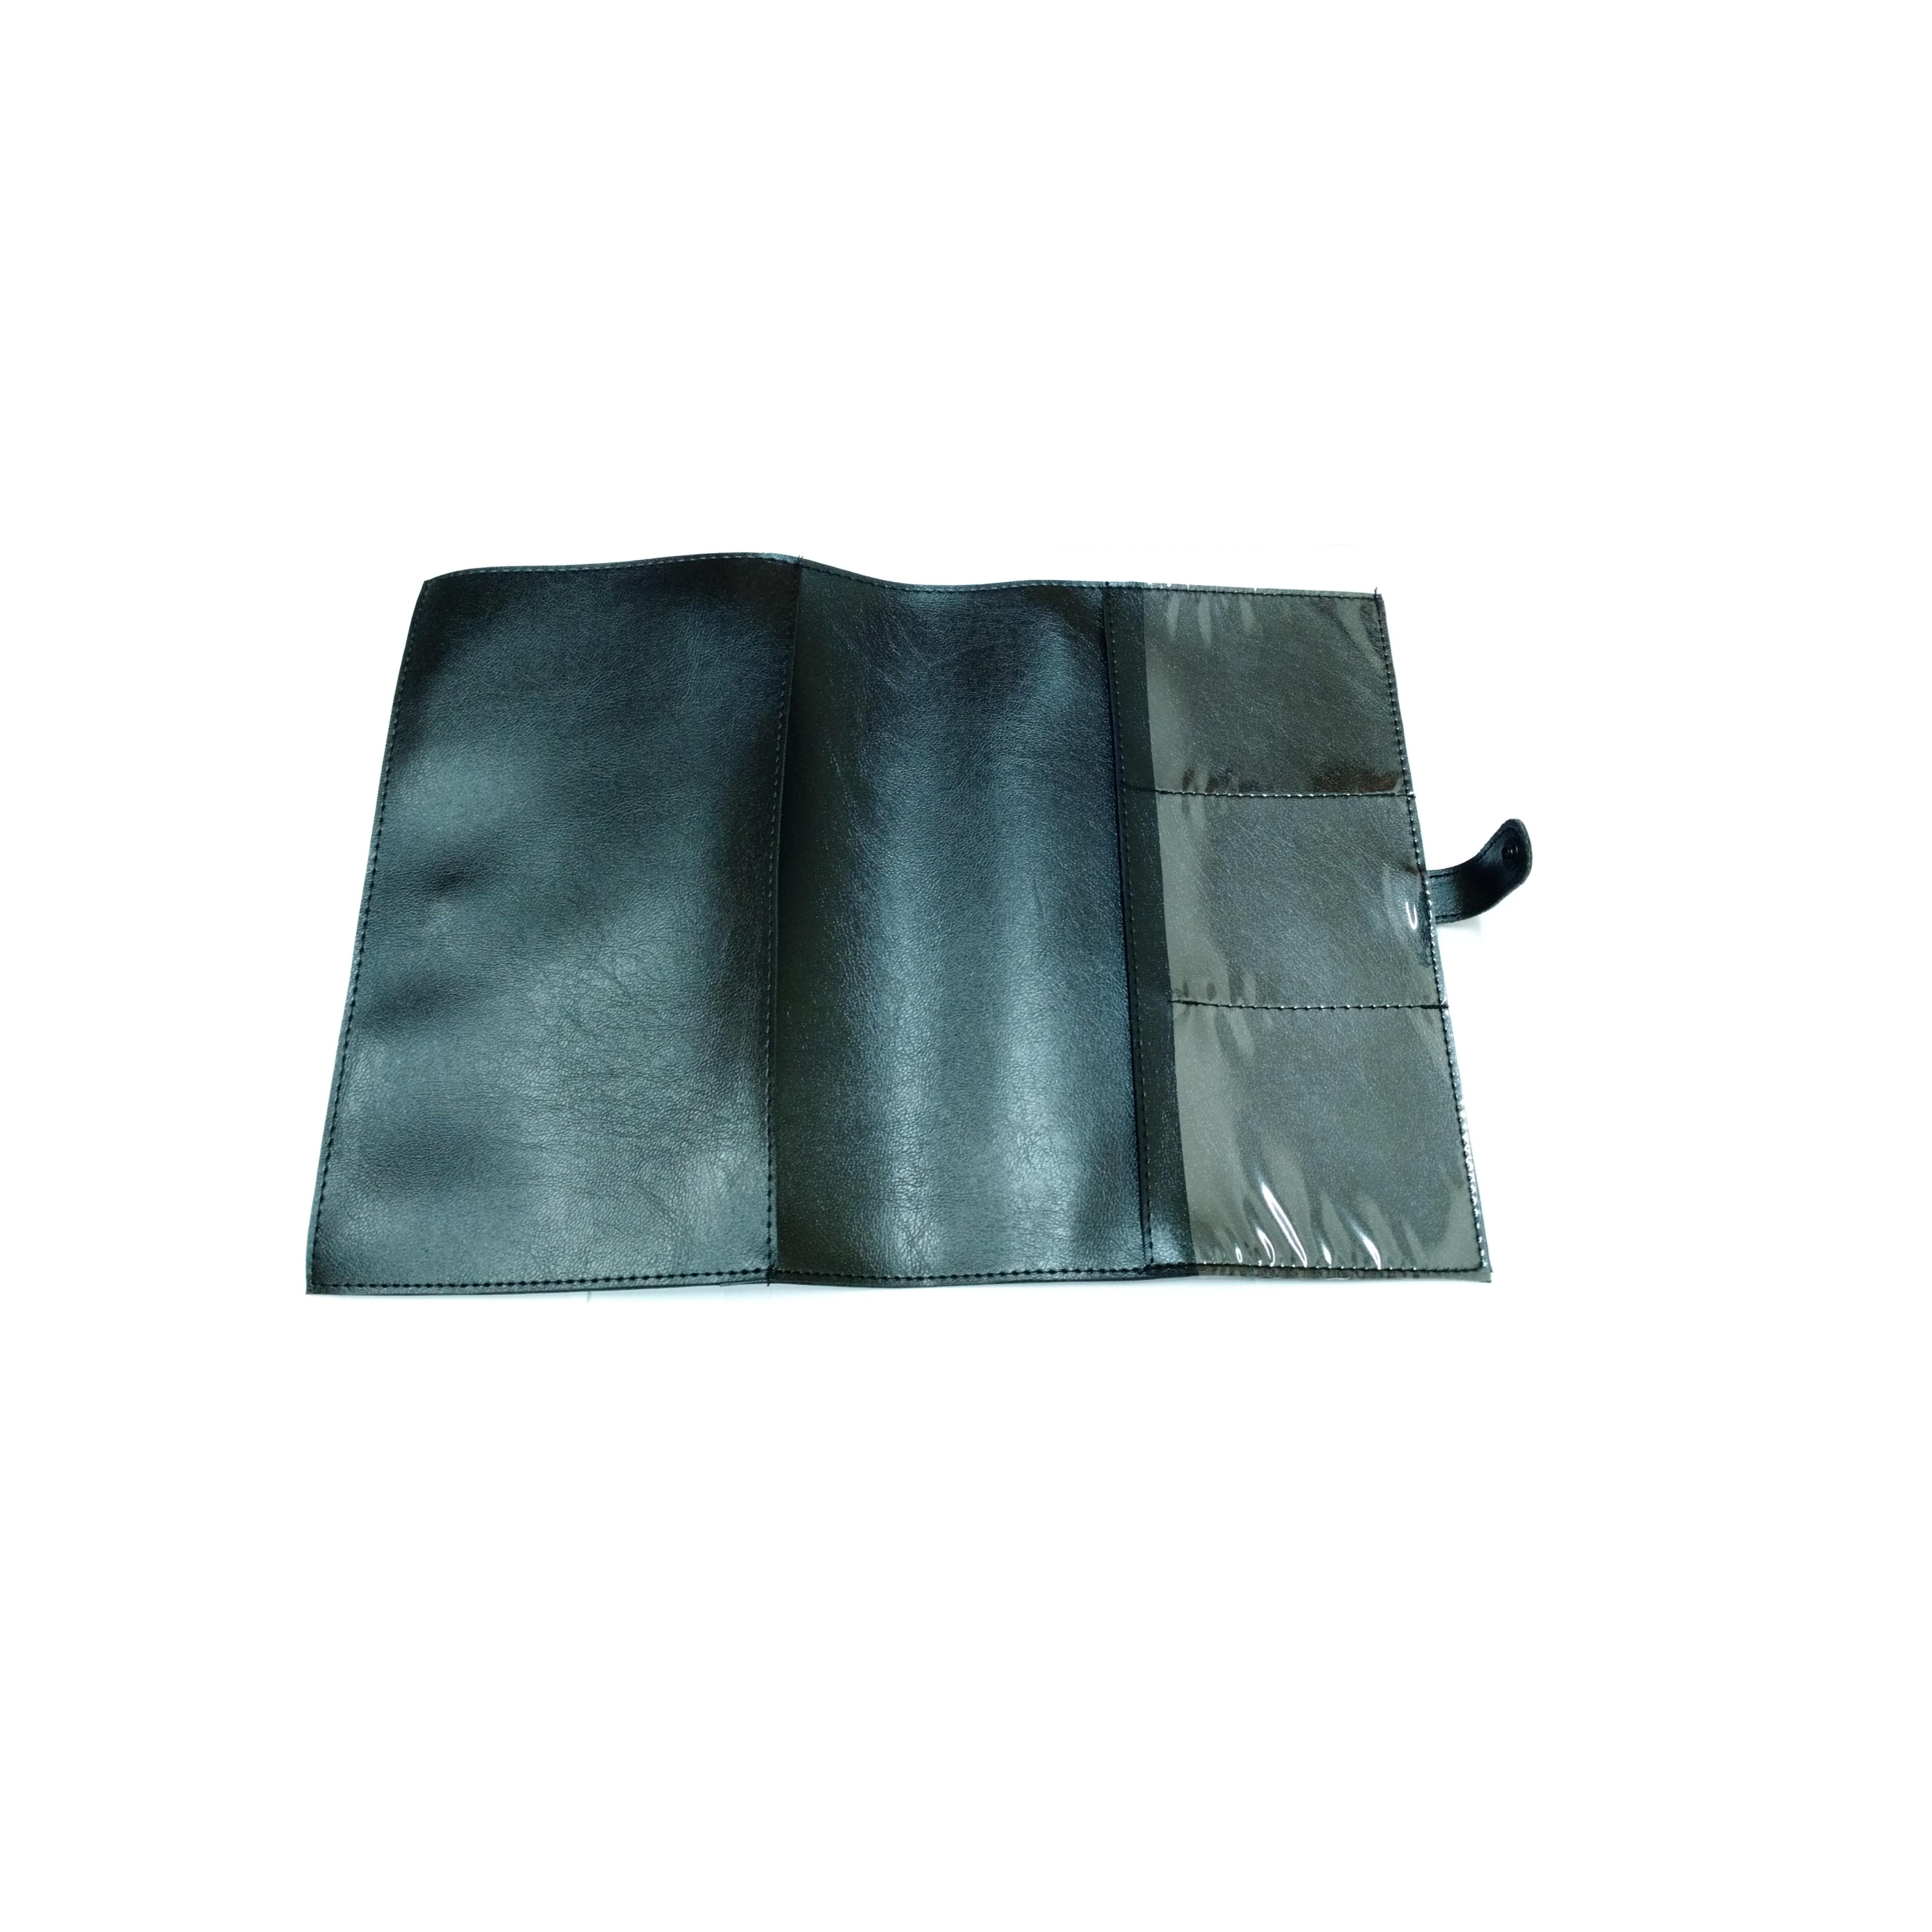 Portadocumentos negro – Art 251 (3)